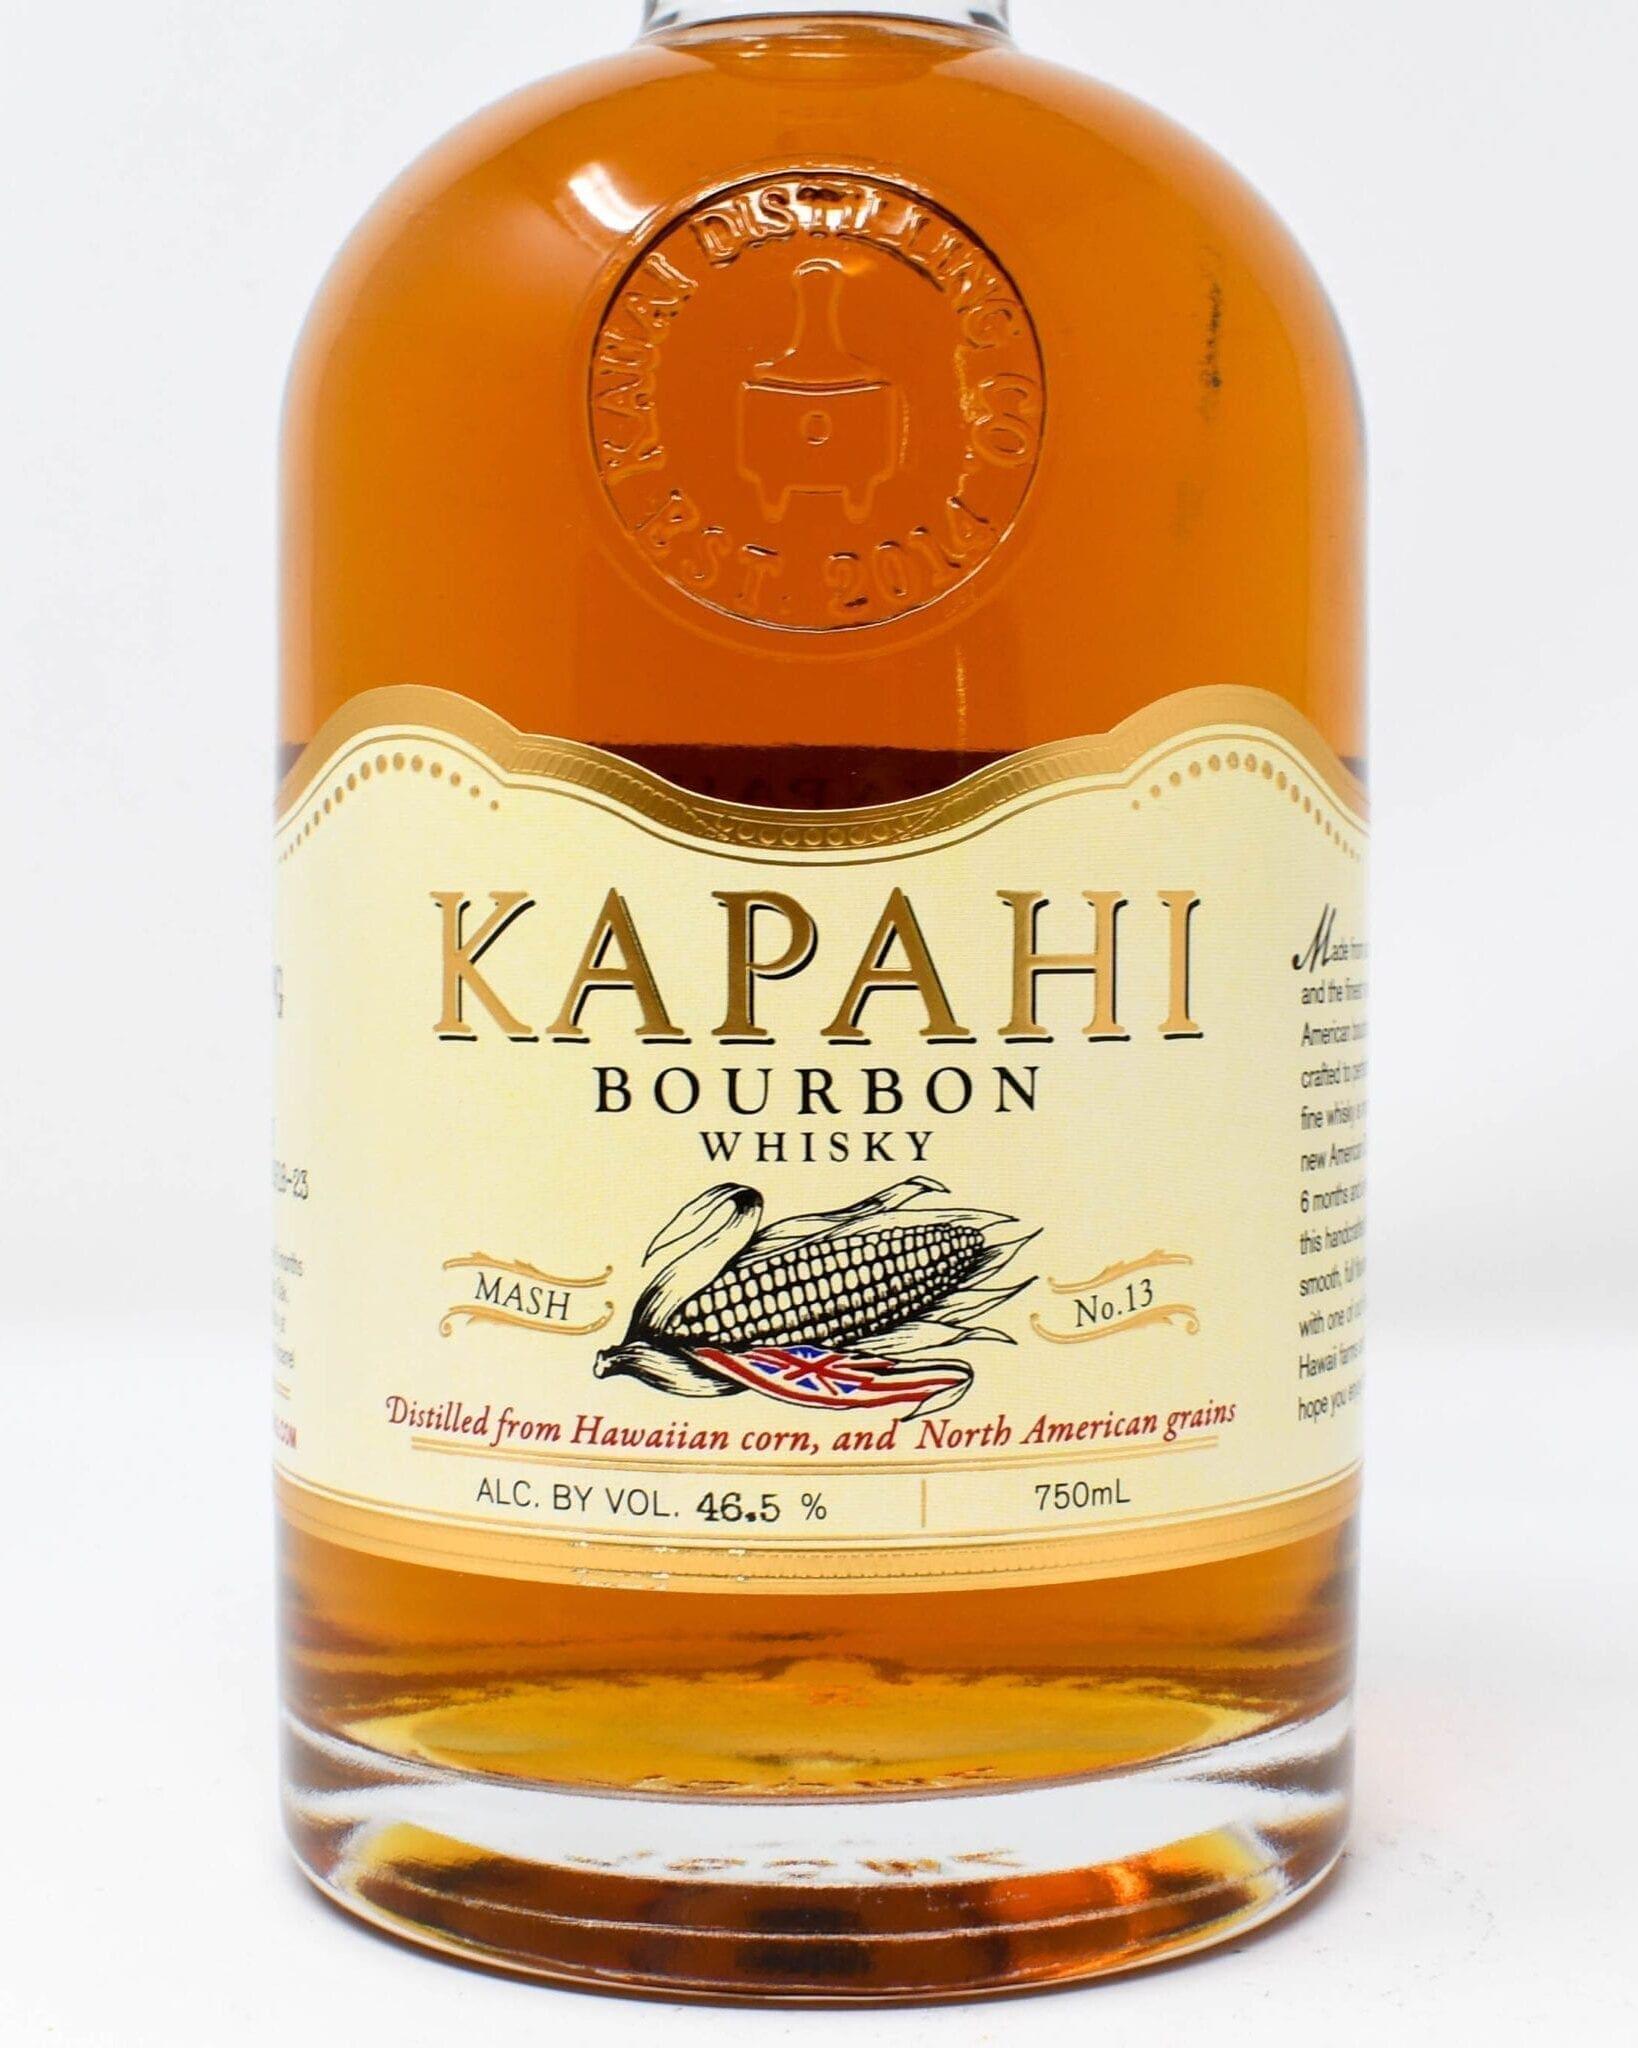 Kapahi Bourbon 750ml made with Kauai grown corn